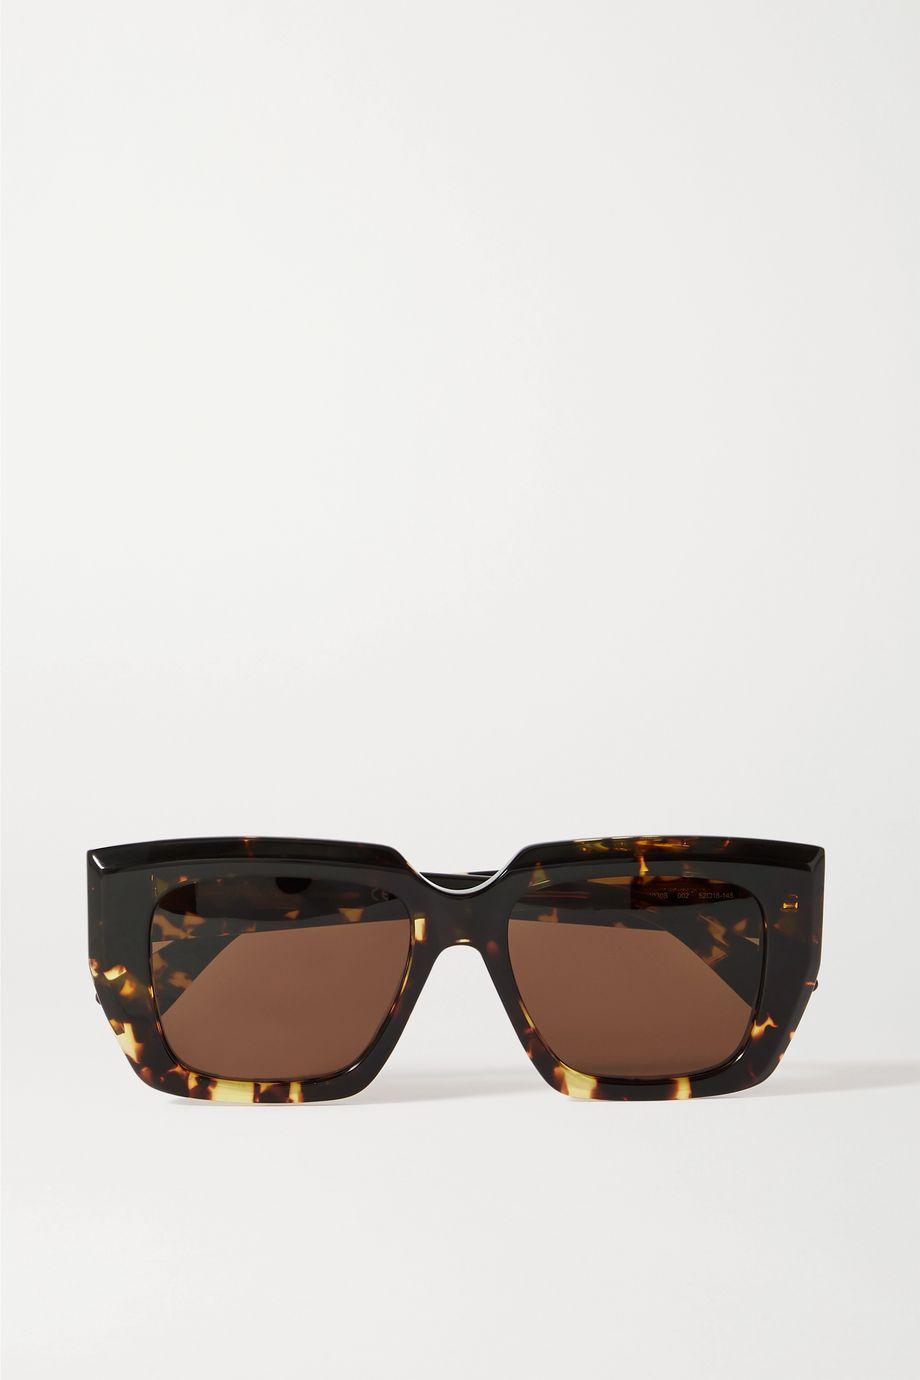 Bottega Veneta Oversized-Sonnenbrille mit eckigem Rahmen aus Azetat in Hornoptik